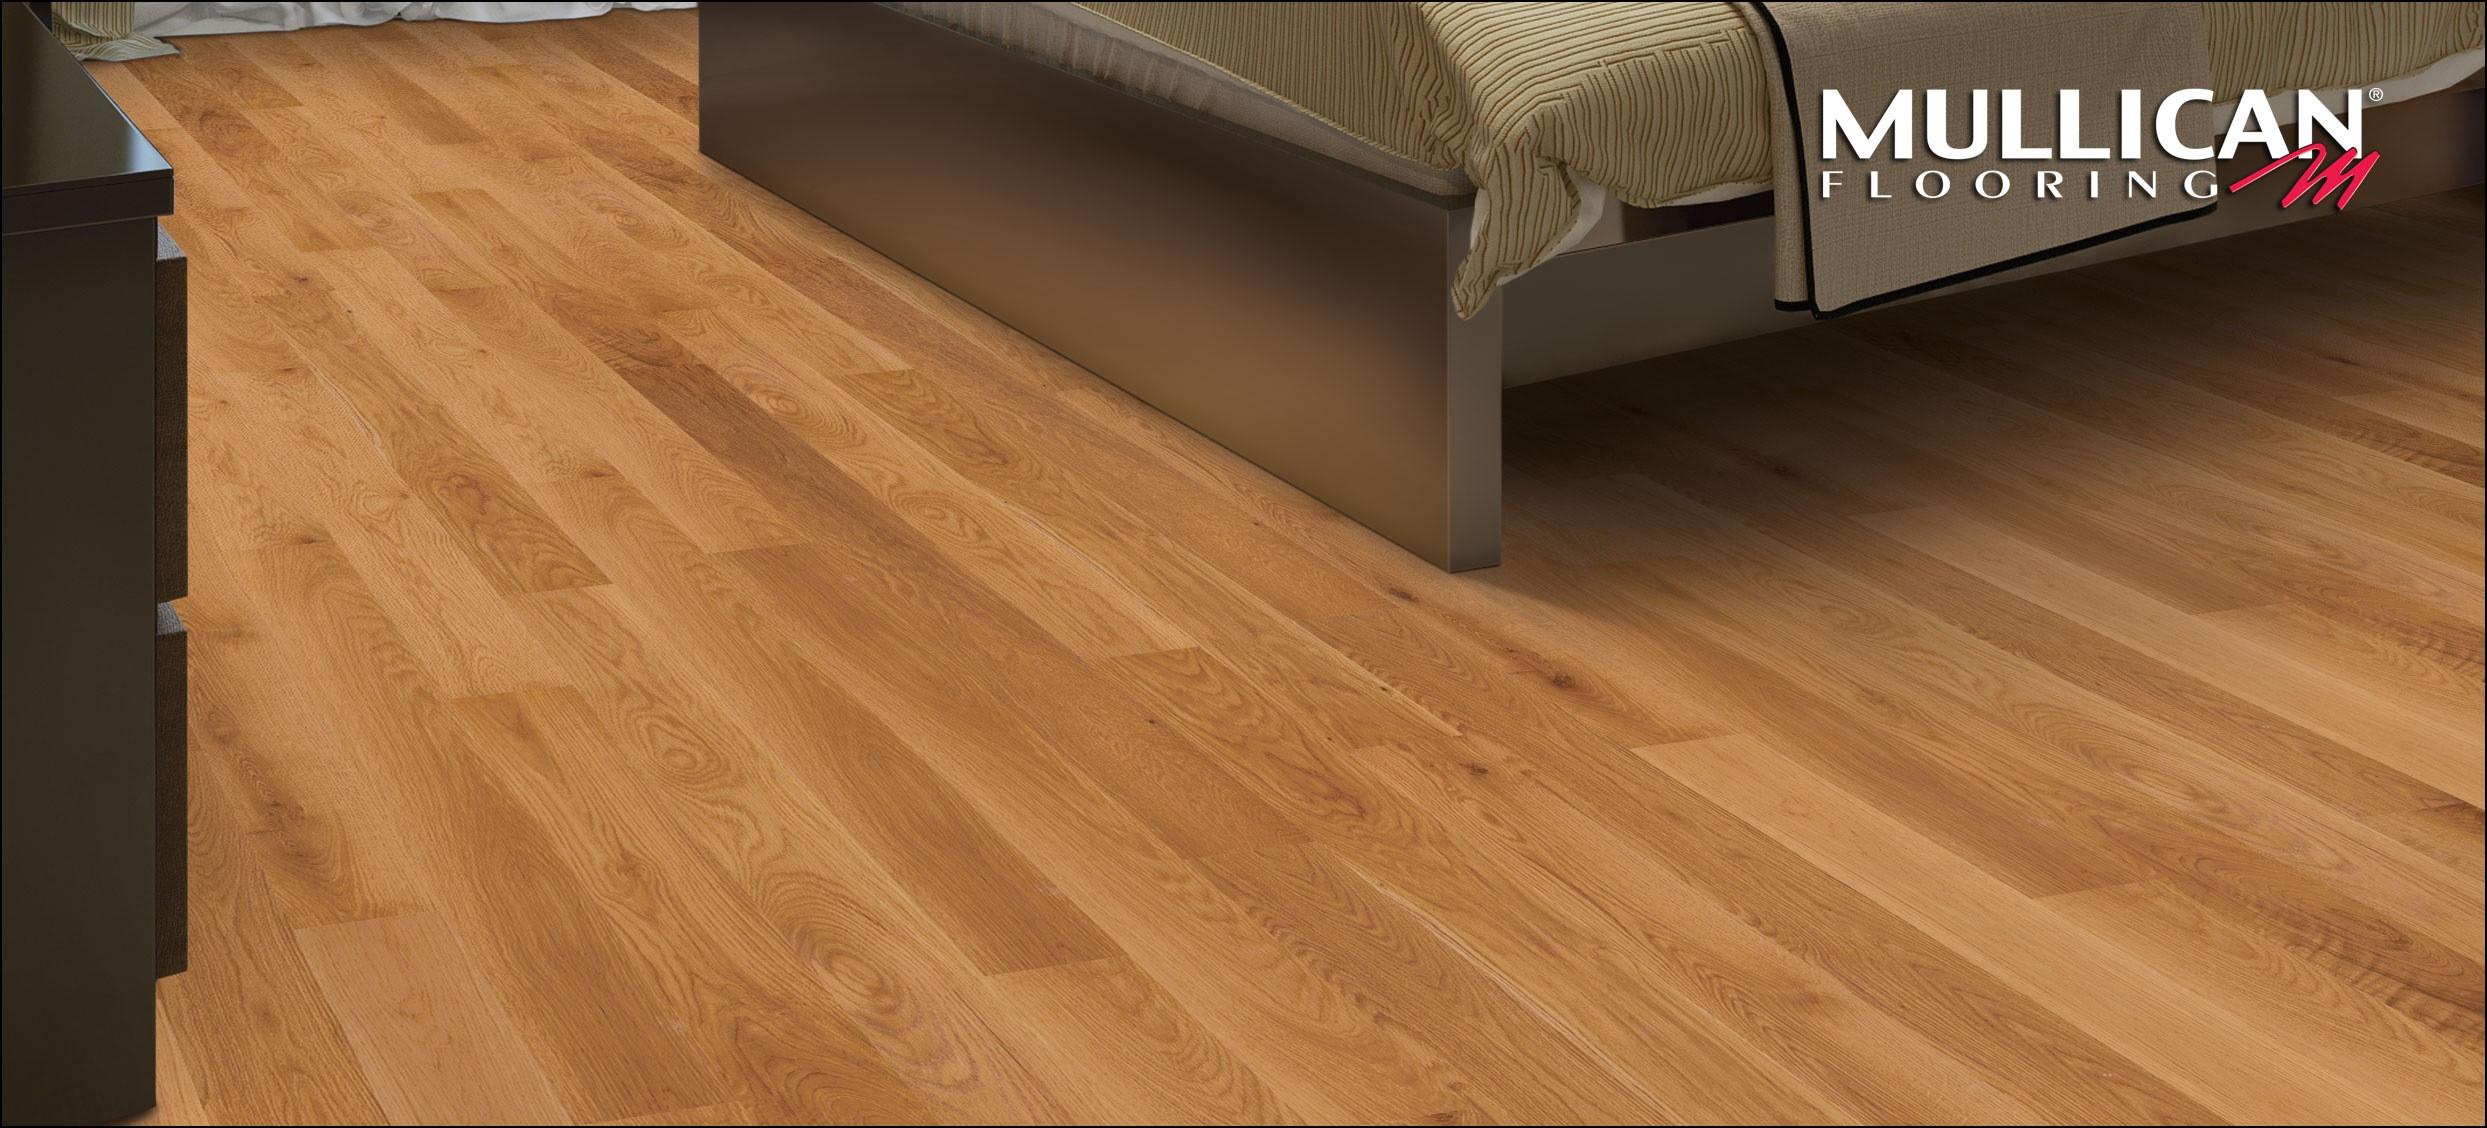 higgins hardwood flooring reviews of hardwood flooring suppliers france flooring ideas in hardwood flooring installation san diego collection mullican flooring home of hardwood flooring installation san diego